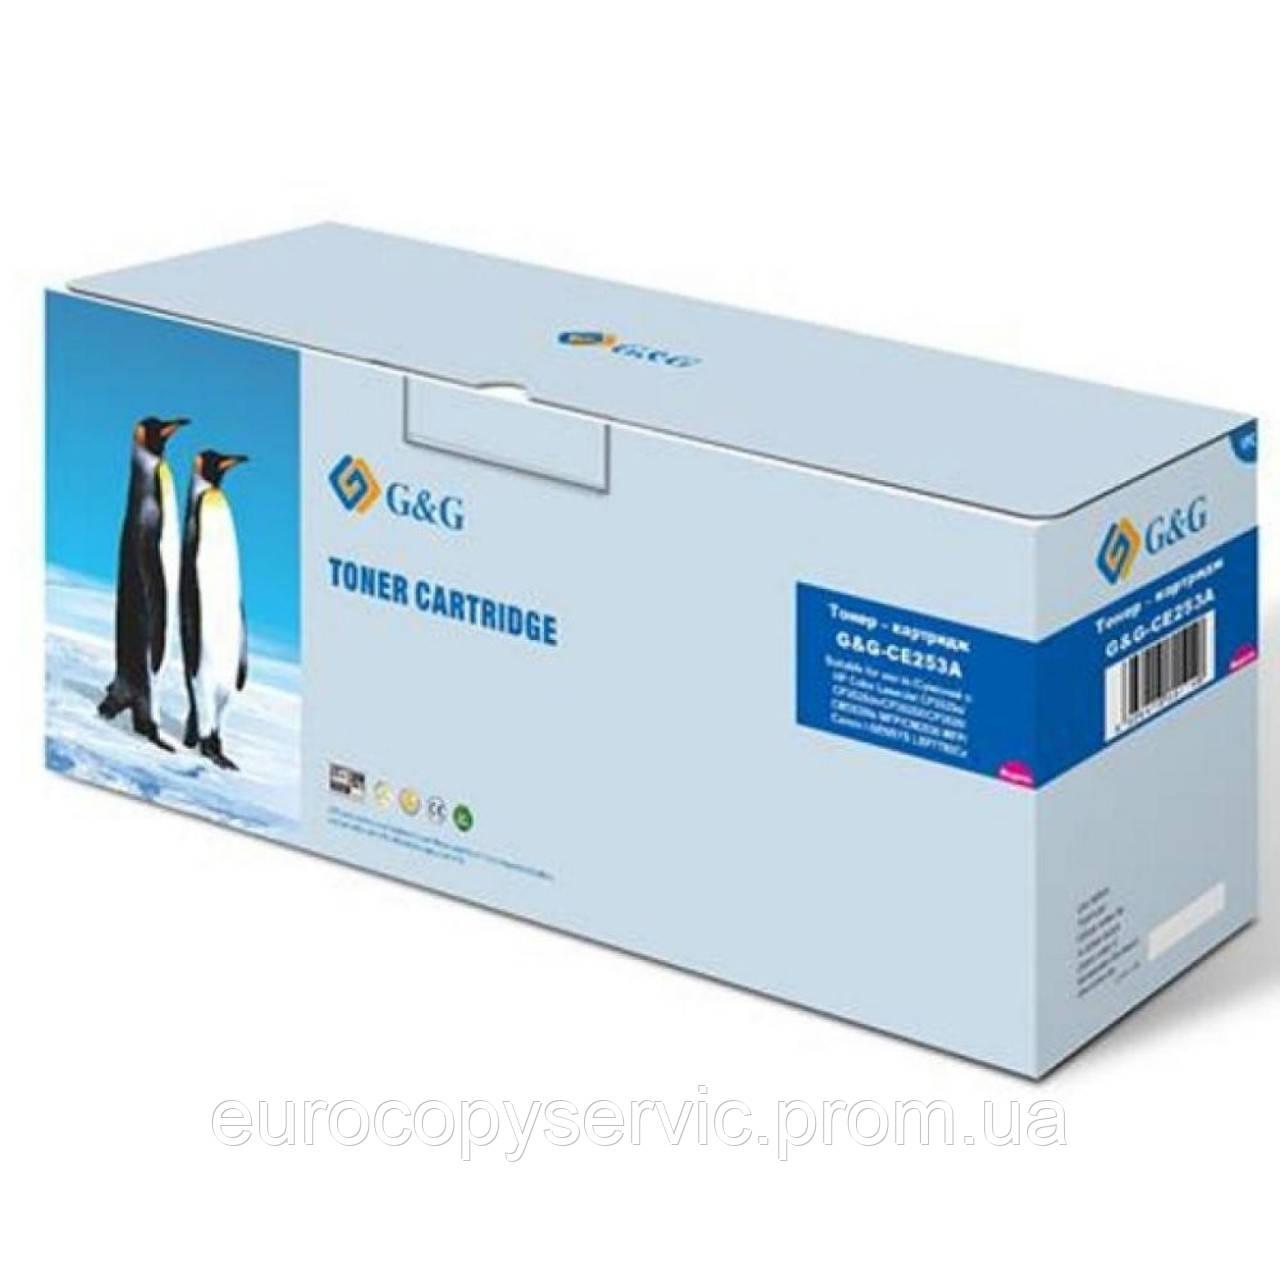 Картридж G&G для HP Color LaserJet CP3525n/CP3520 CM3530fs/Canon LBP7780Cx-732 Yellow